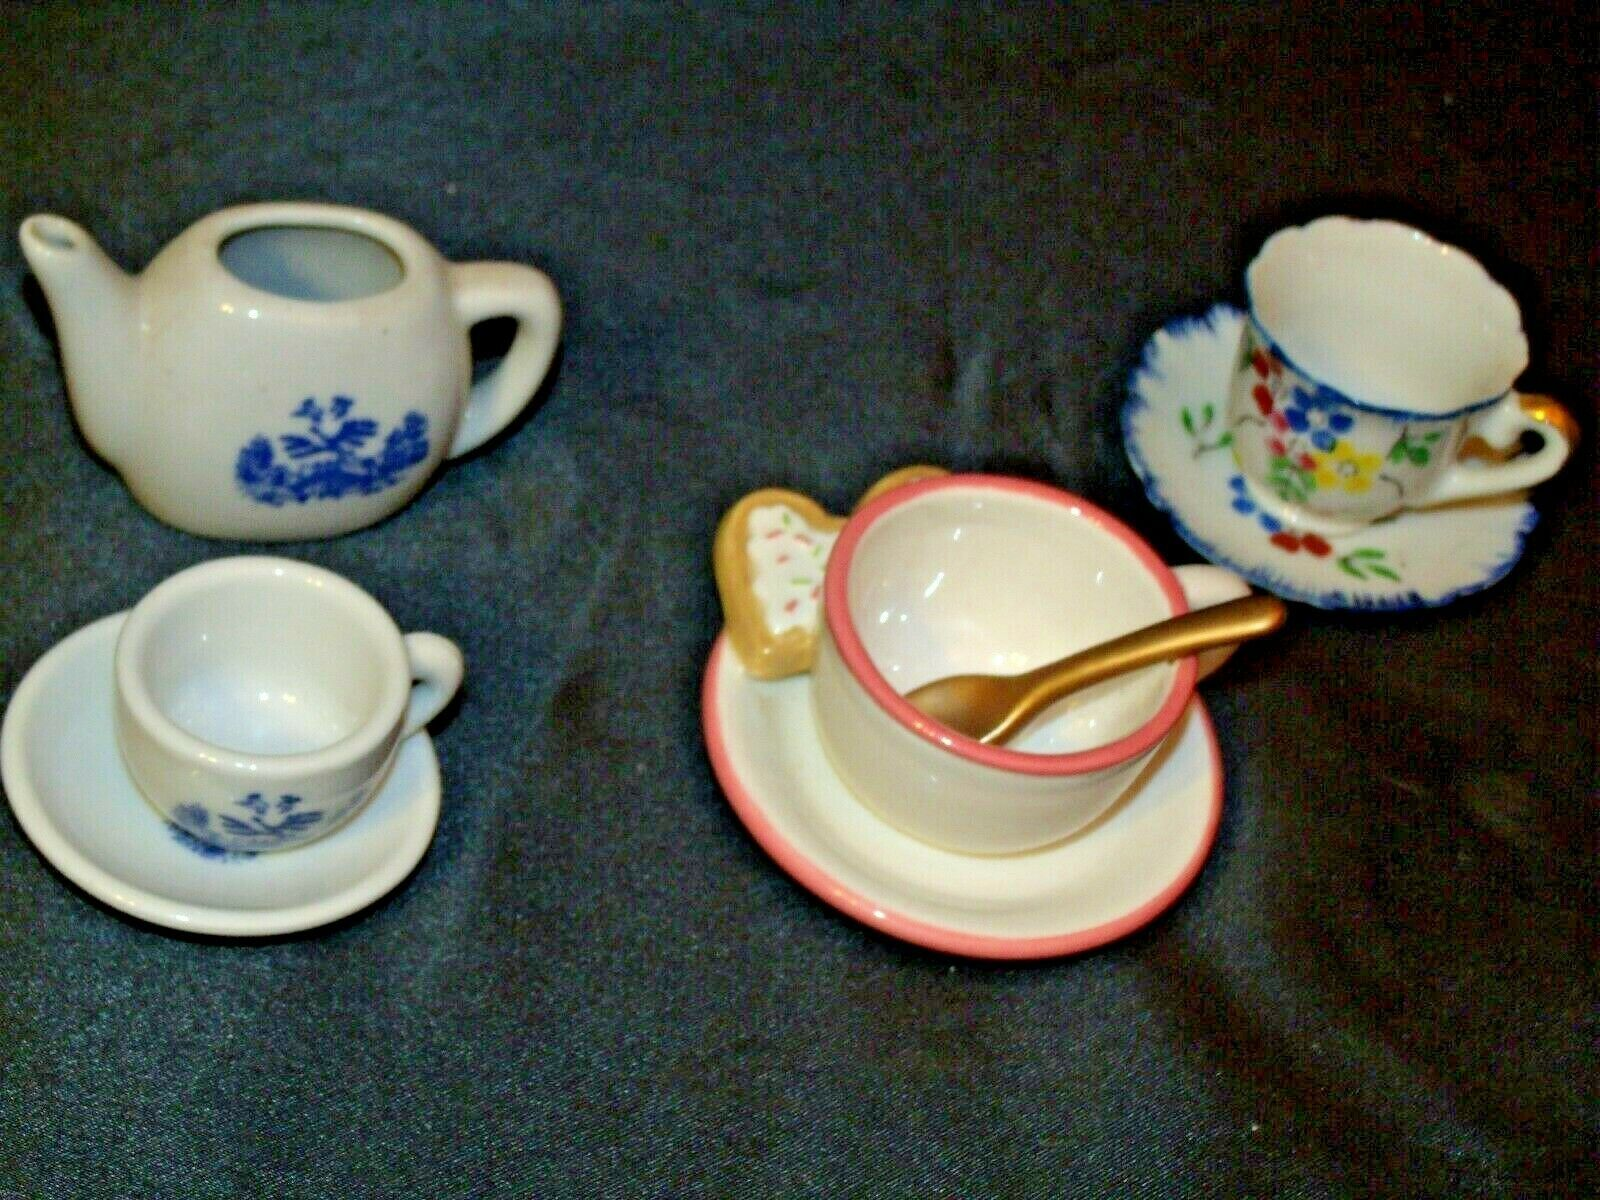 Miniature Pitcher, Tea Cups & Saucers AB 299 Vintage